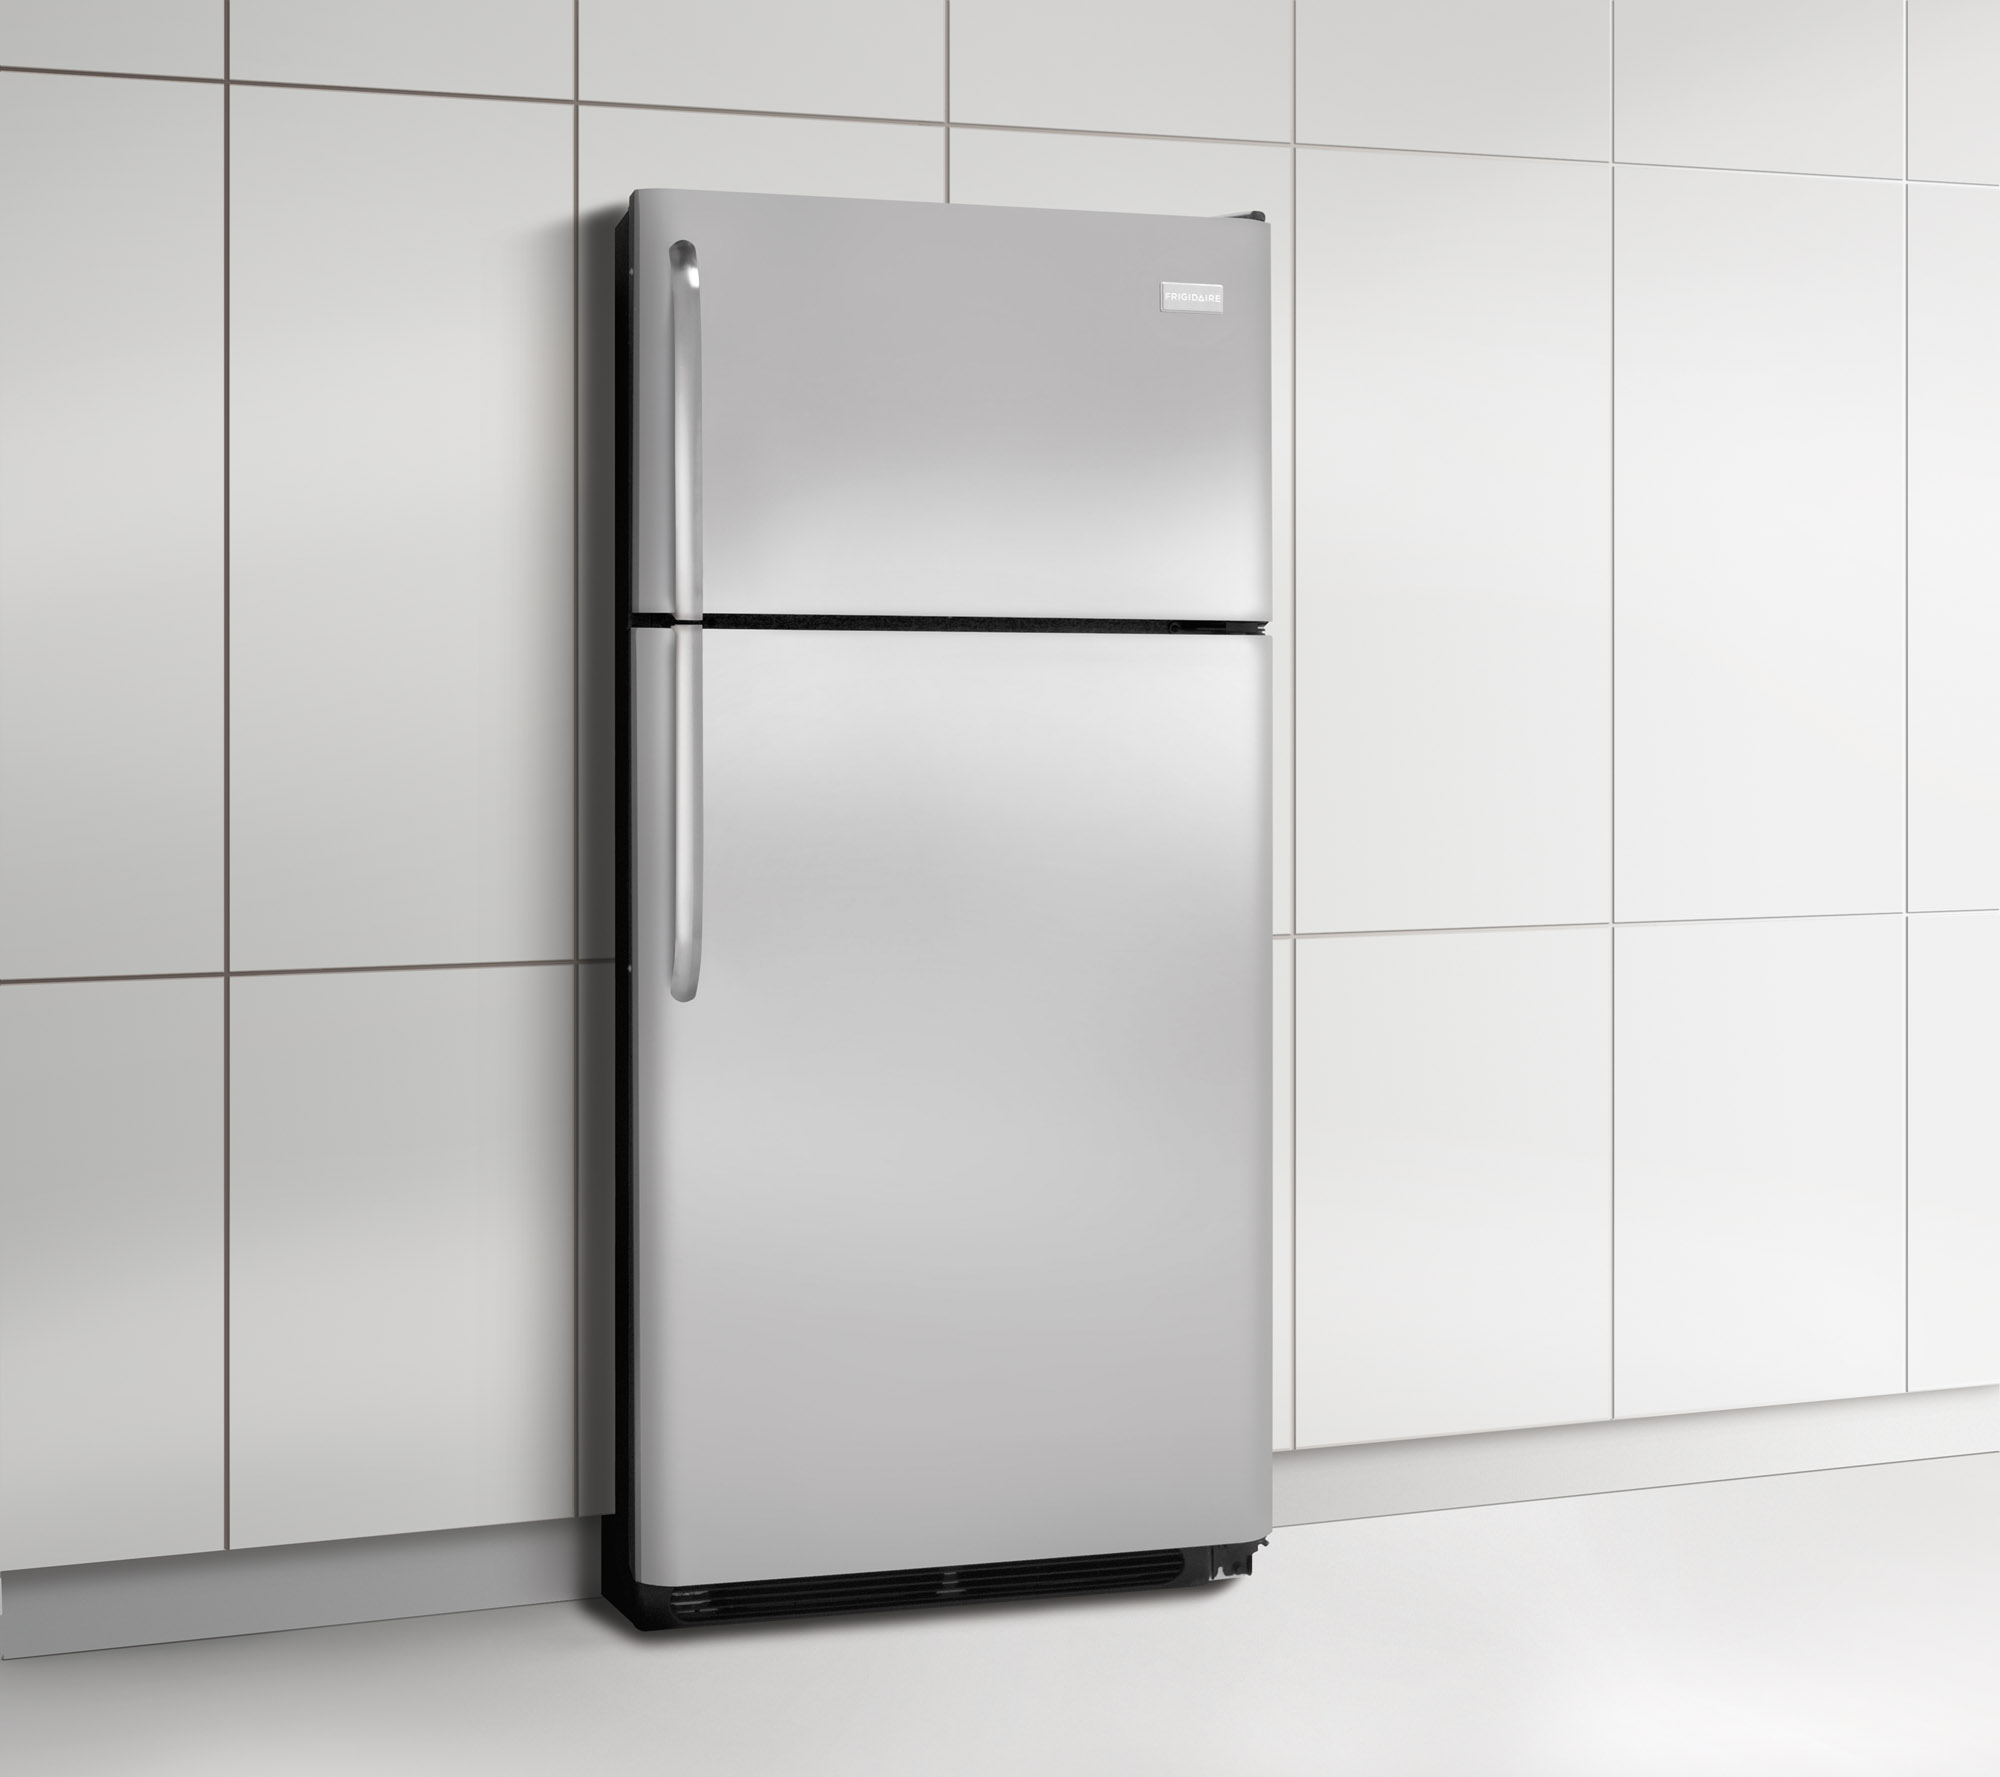 Frigidaire FFHI1831QS 18 cu. ft. Top Freezer Refrigerator - Stainless Steel